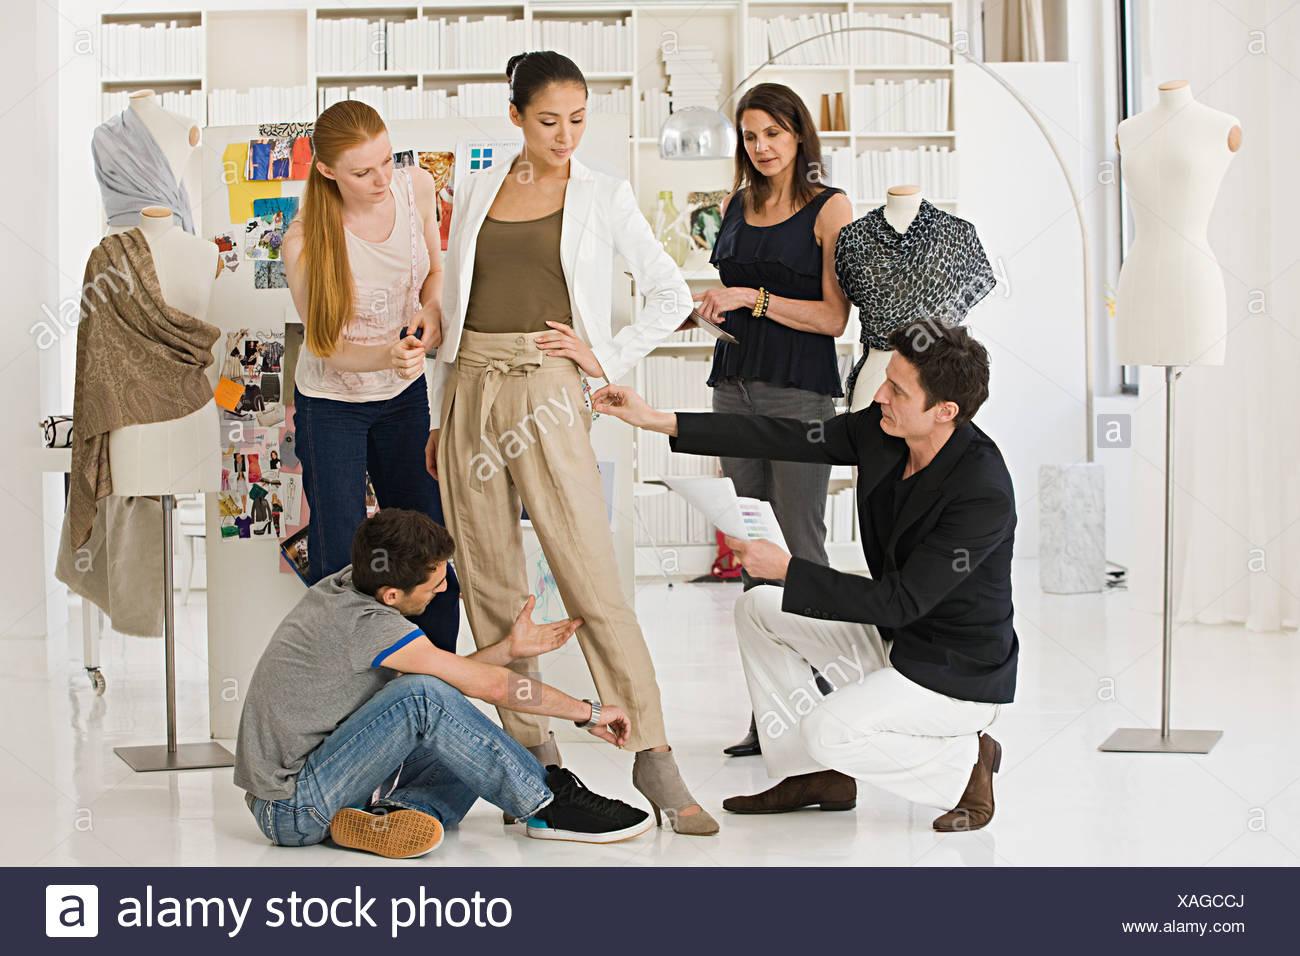 fashion designers at work stock photo 281873442 alamyfashion designers at work